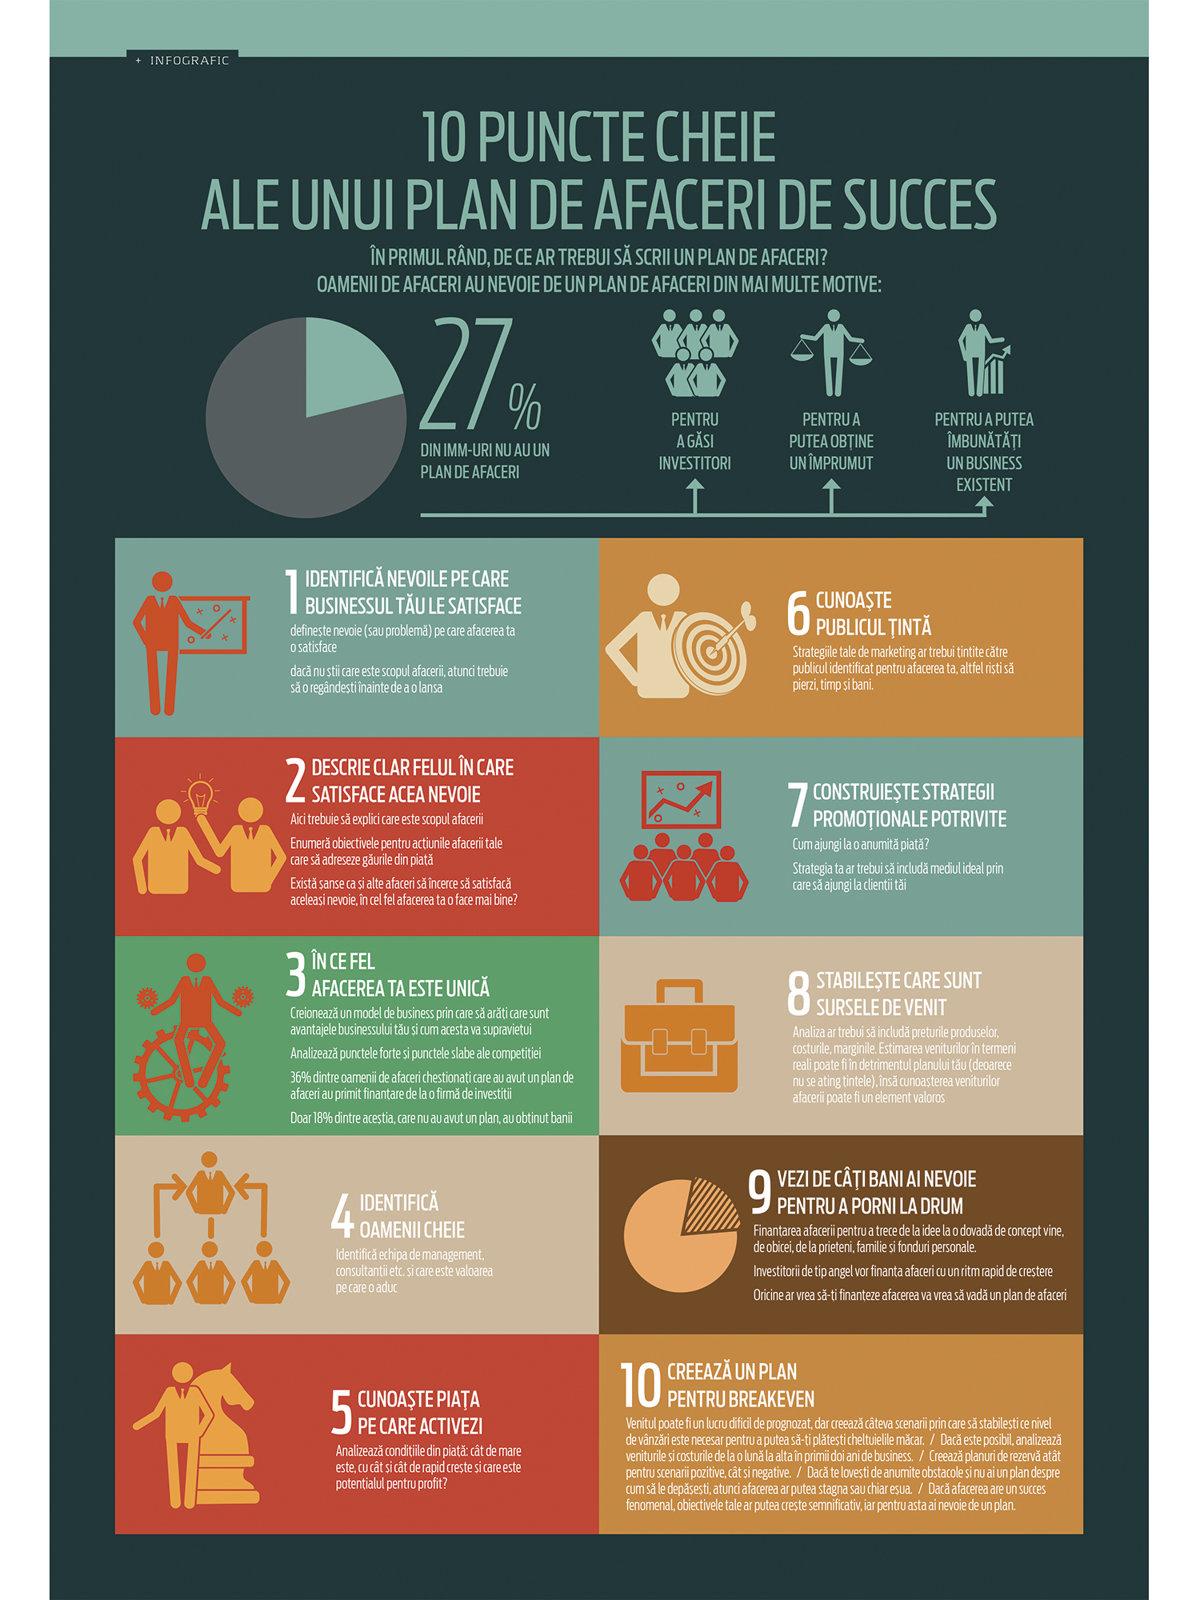 10 puncte cheie ale unui plan de afaceri de succes